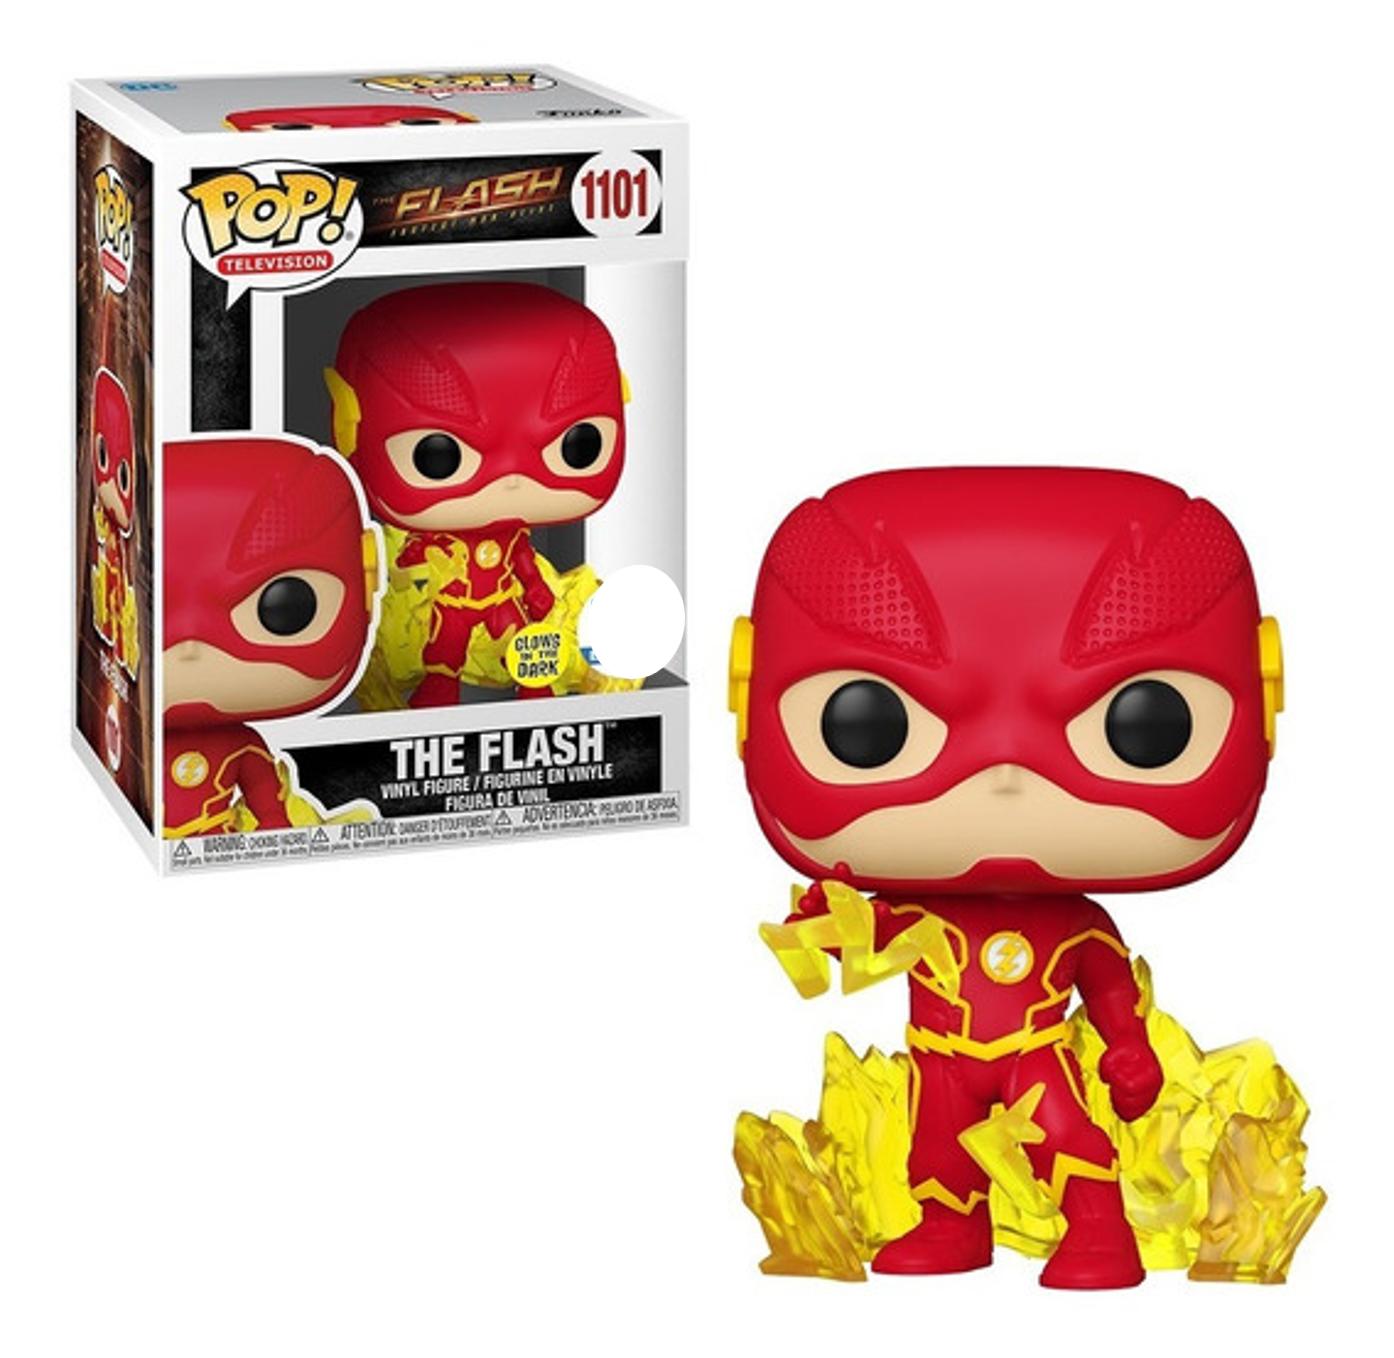 Funko Pop! The Flash (Glow in the Dark) - DC